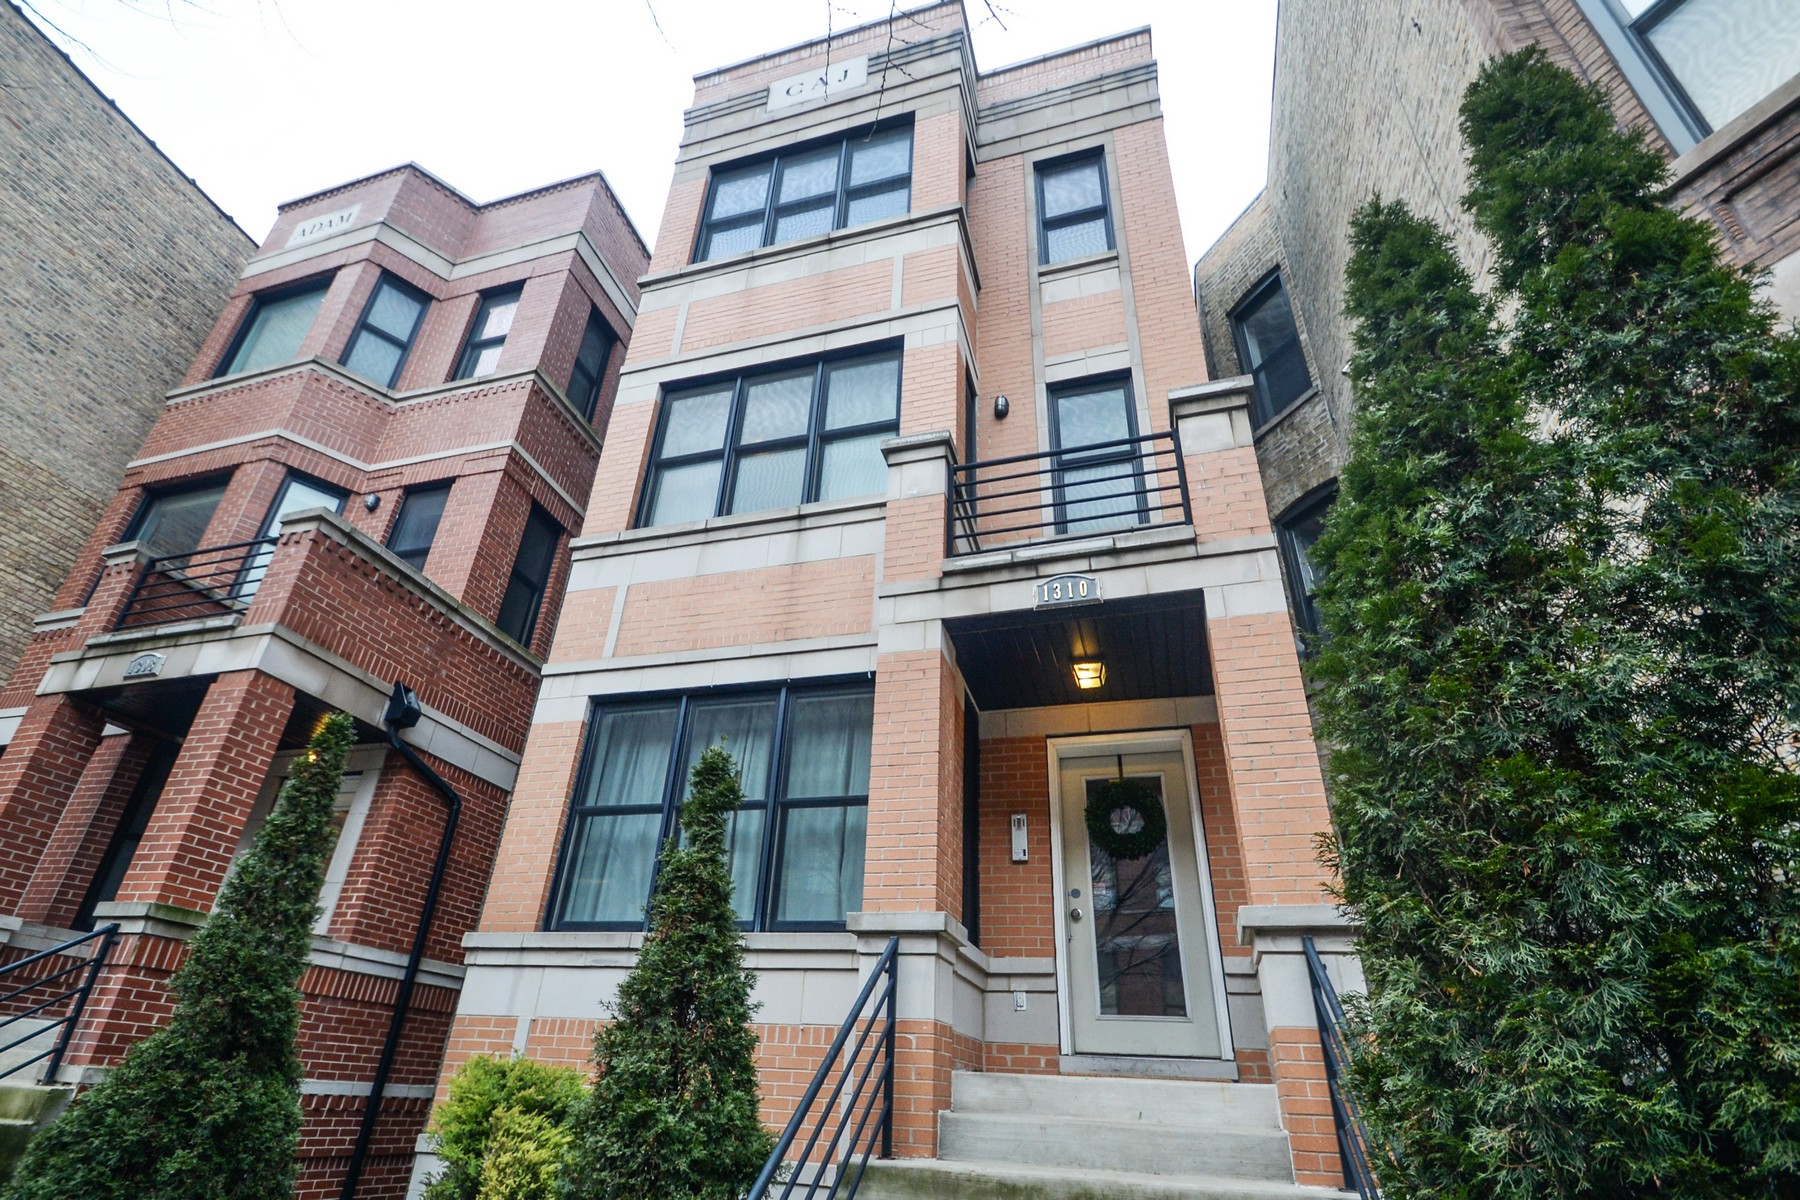 Condominium for Sale at Spacious Condo in Ideal Wicker Park Location! 1310 N Claremont Avenue Unit 2 West Town, Chicago, Illinois, 60622 United States